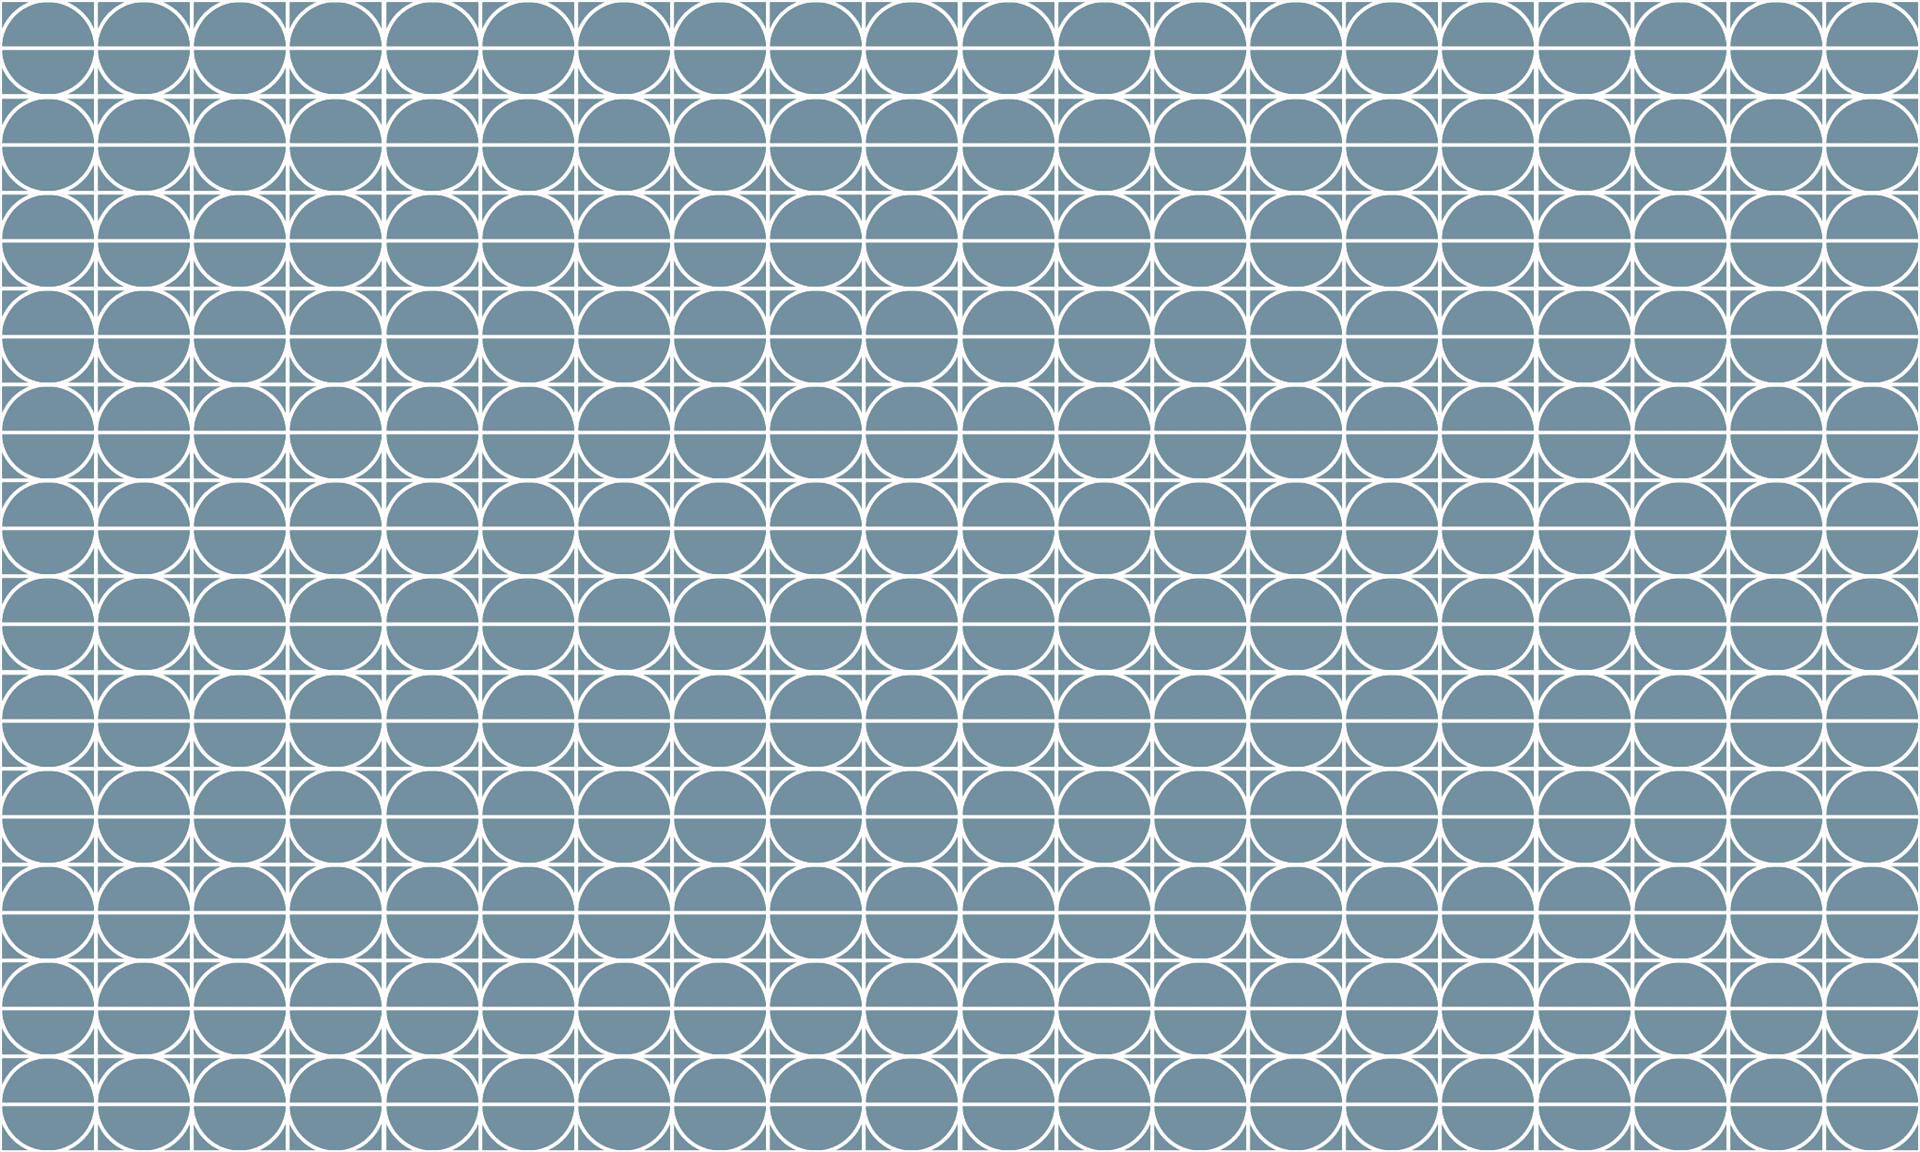 Creative Estuary brand architectural pattern 6